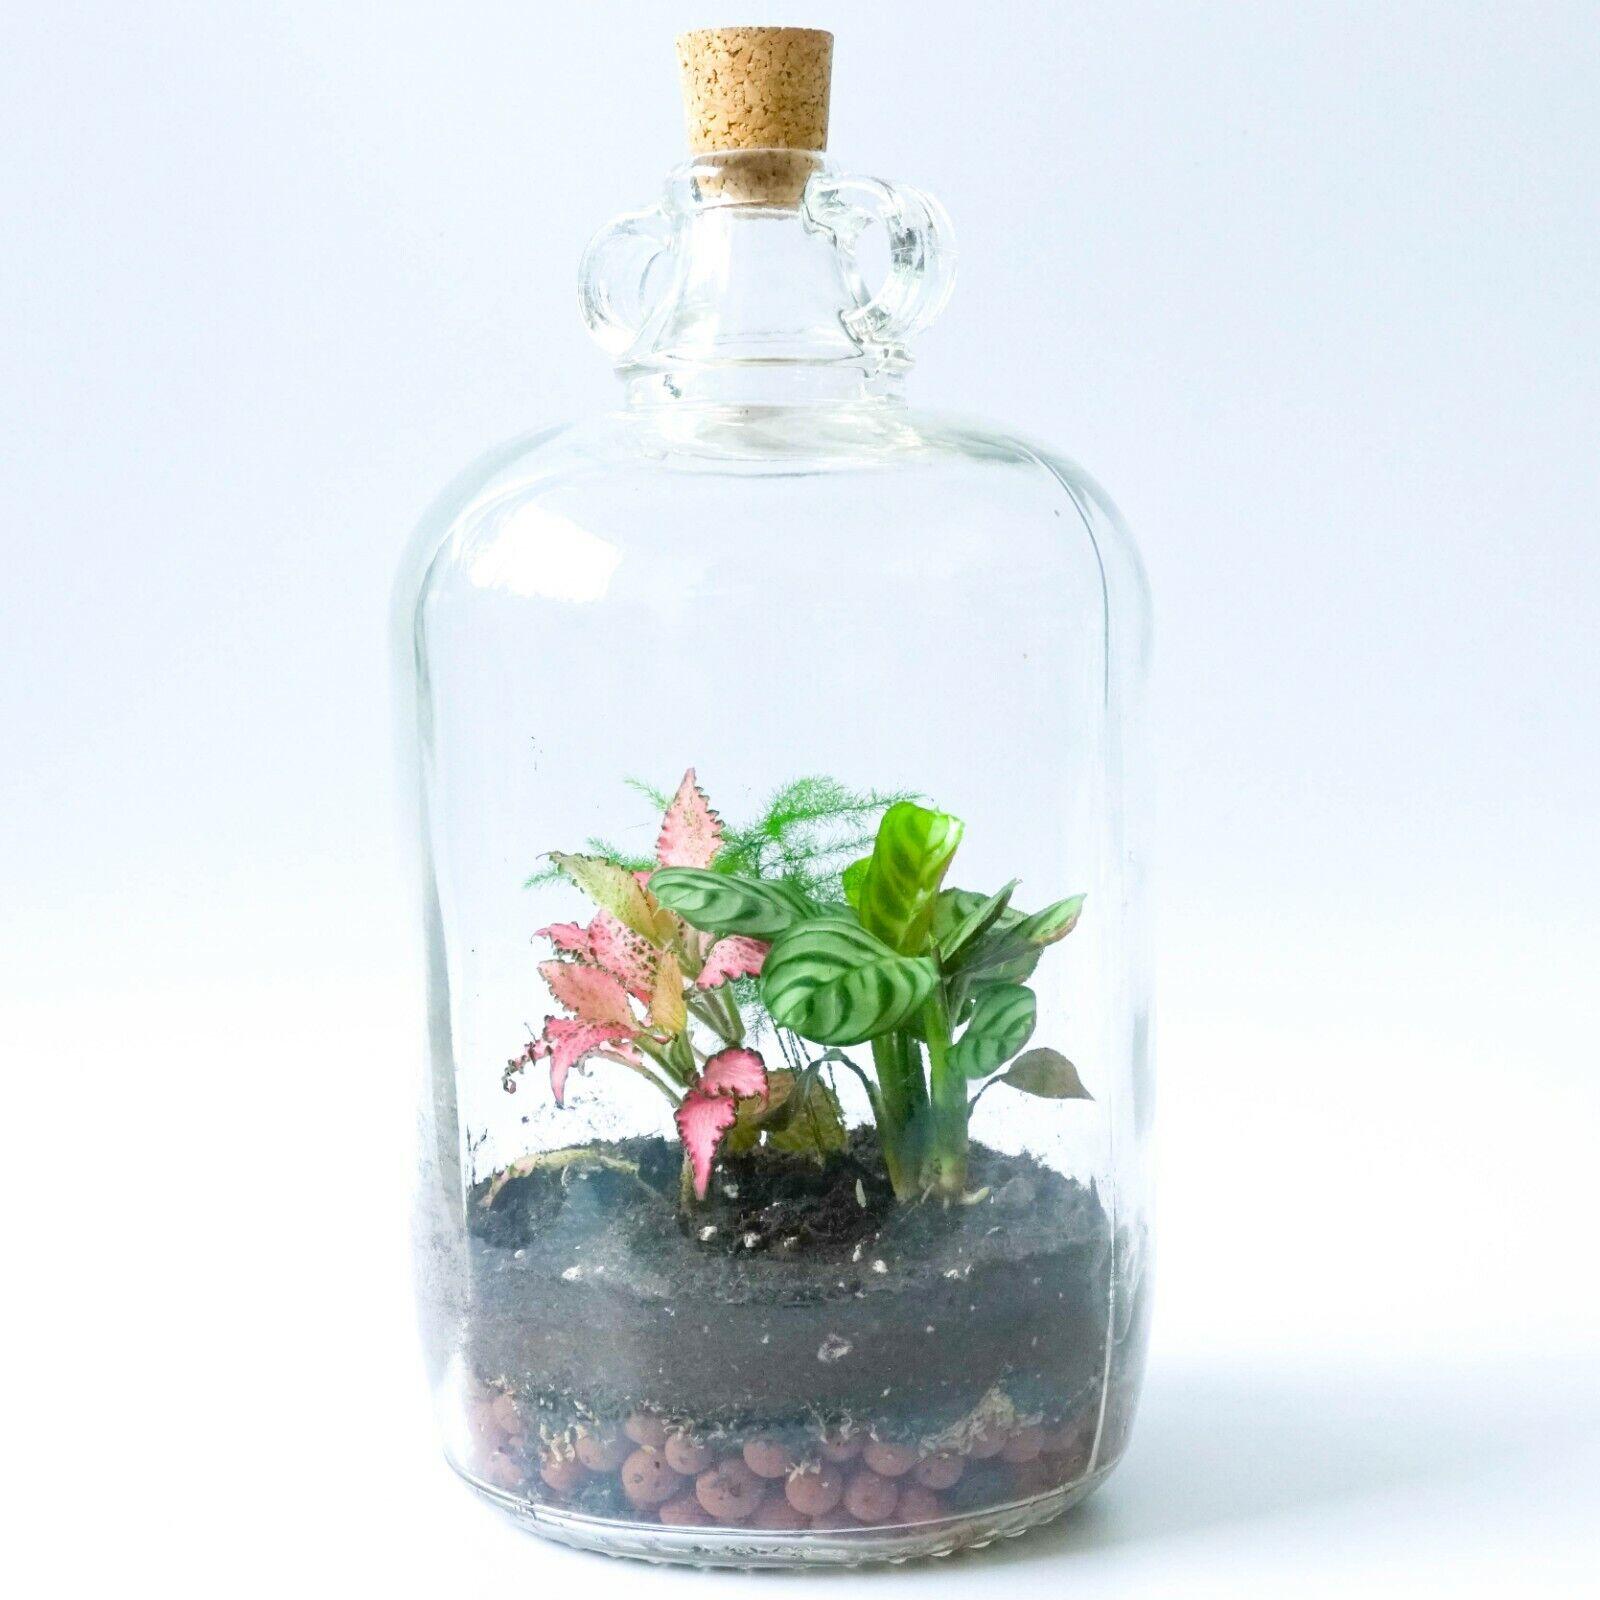 Demijohn Terrarium Kit & Cork Lid DIY Fittonia P er Asparagus Fern Plants